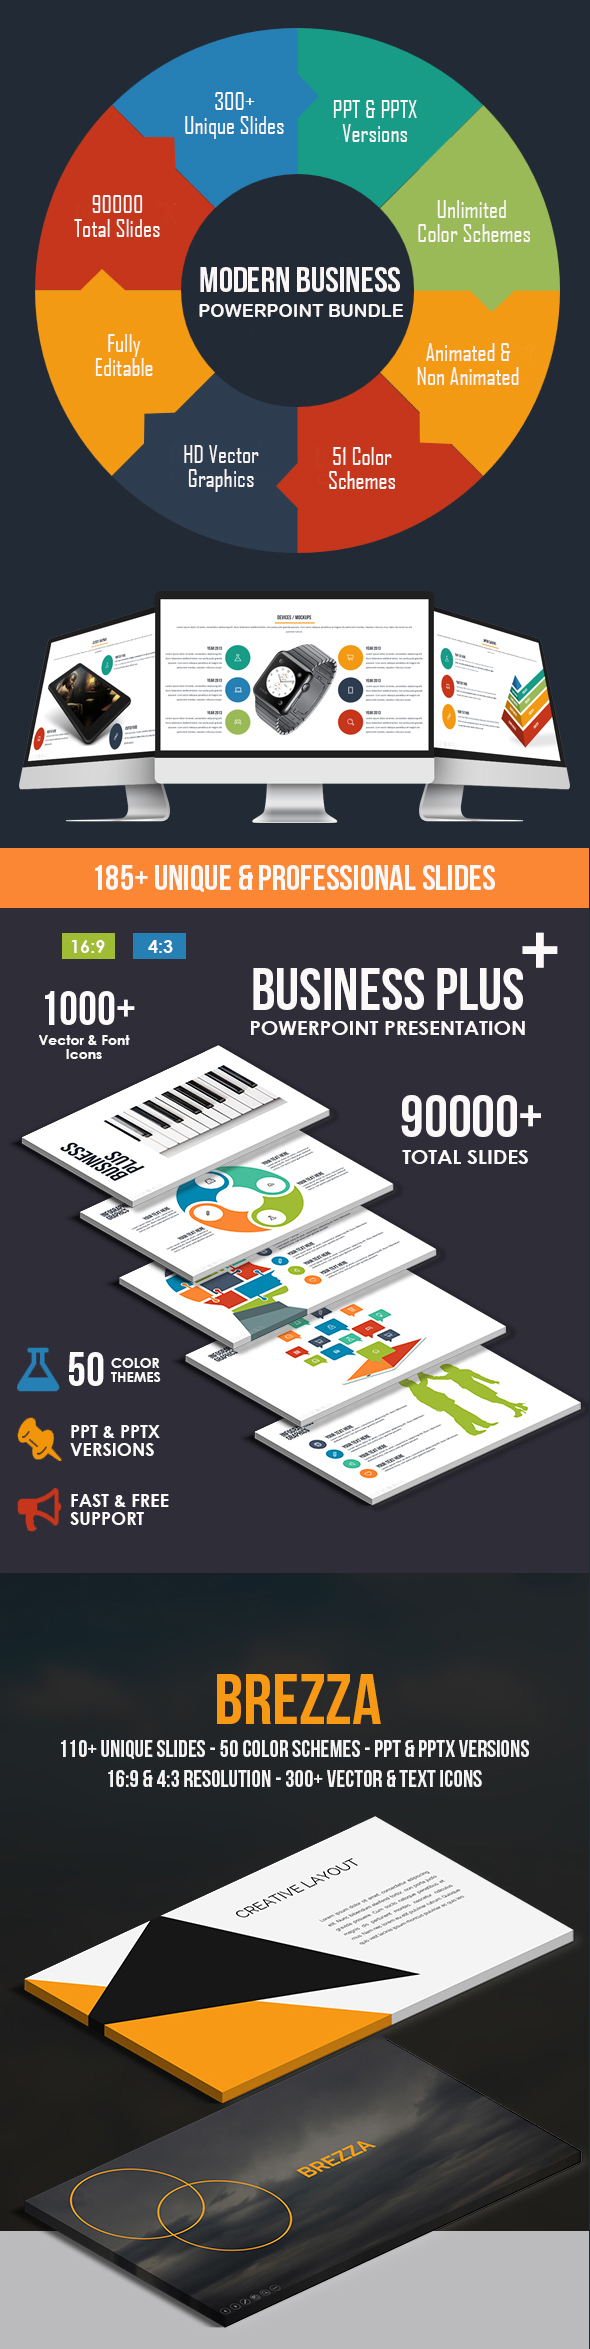 Modern Business Powerpoint Presentations Bundle - Business PowerPoint Templates